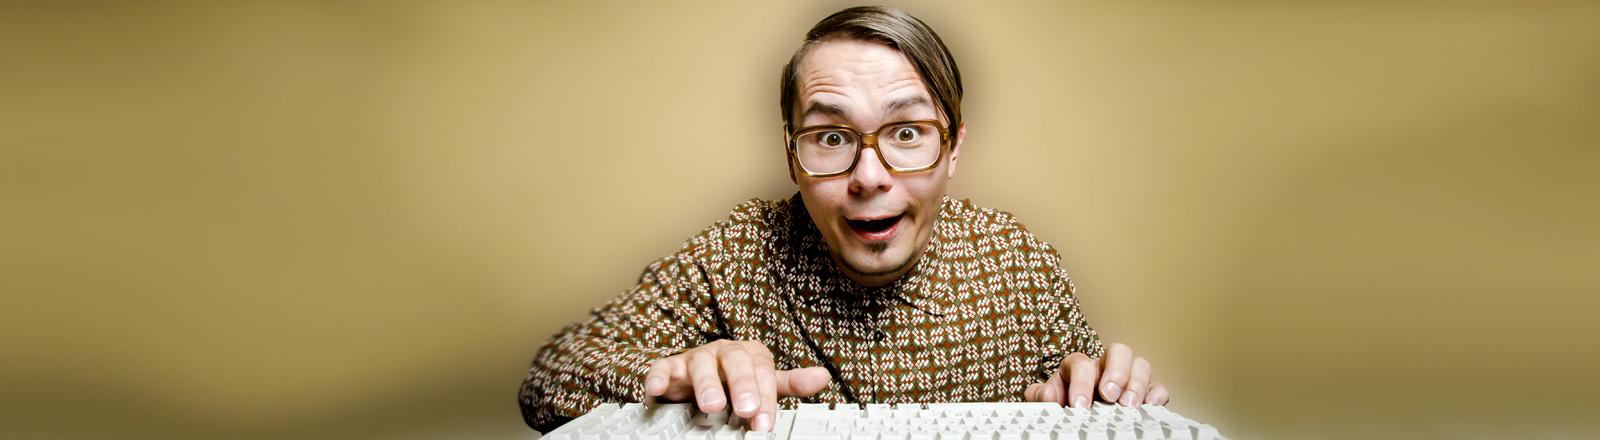 Mann mit Hornbrille an altem Computer